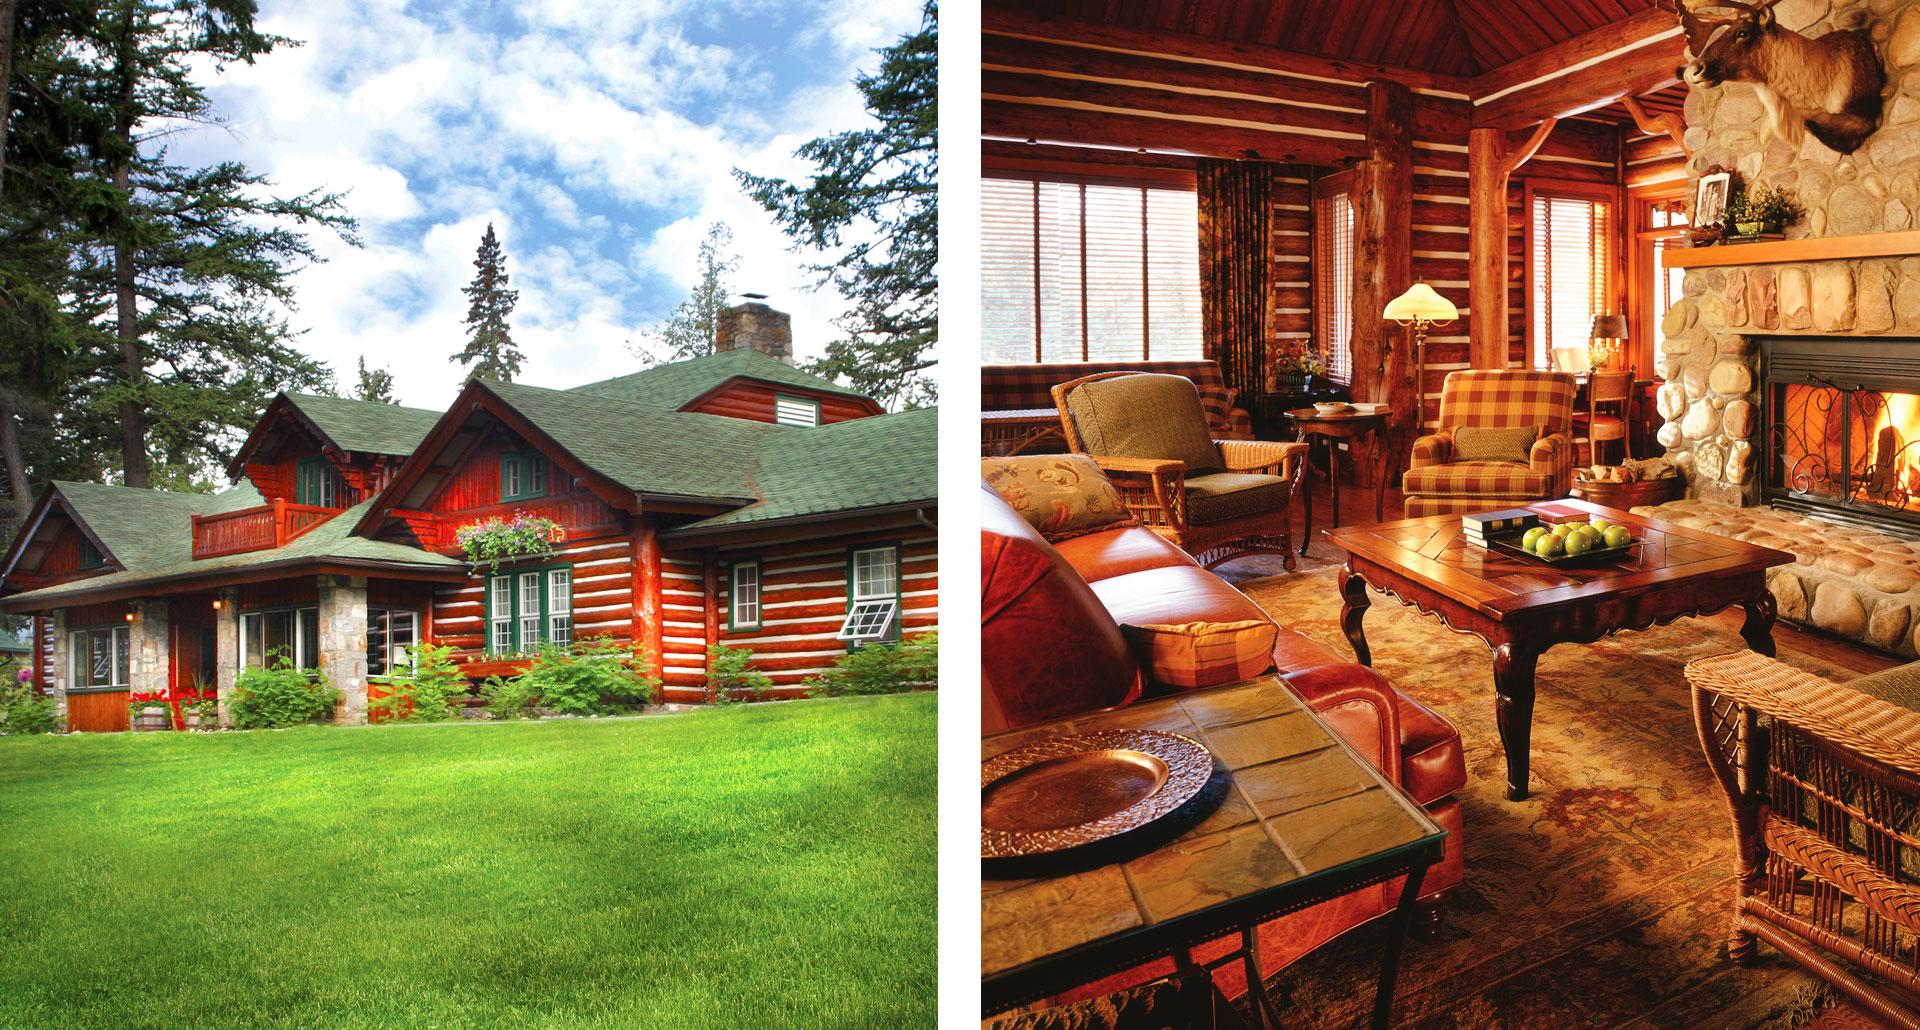 Fairmount Jasper Park Lodge - boutique hotel in Jasper